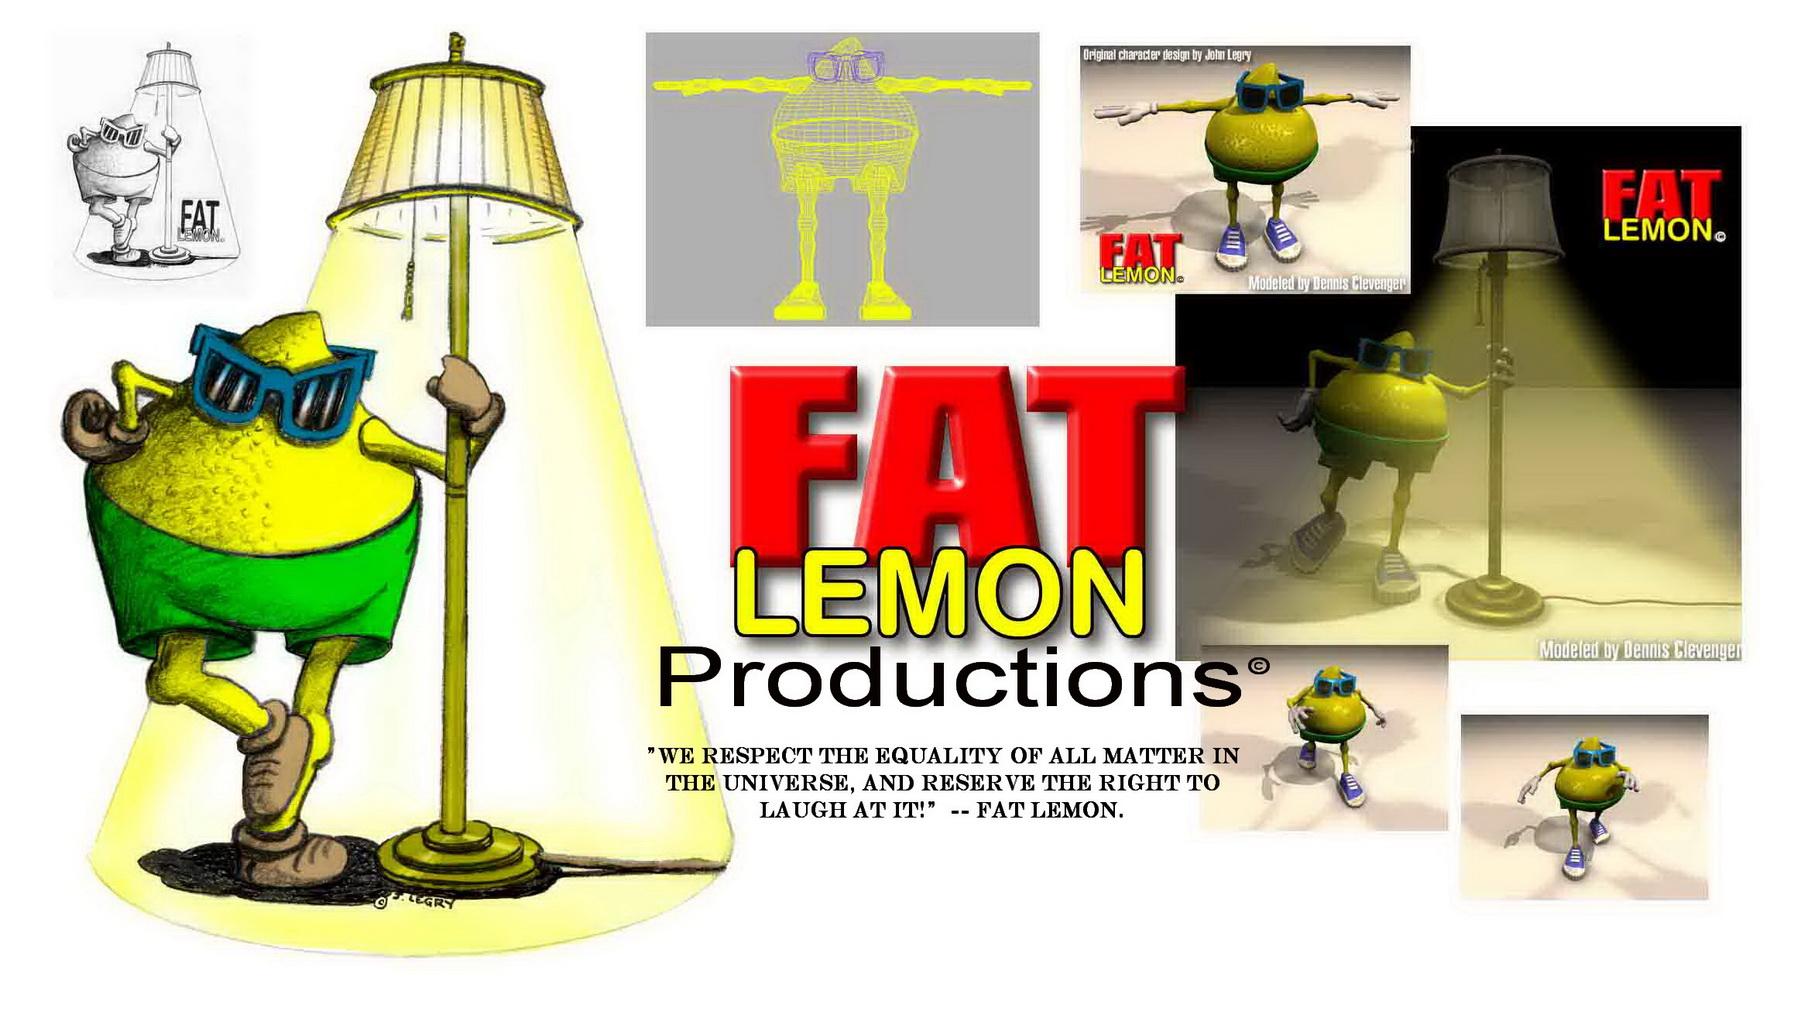 FatLemon Productions